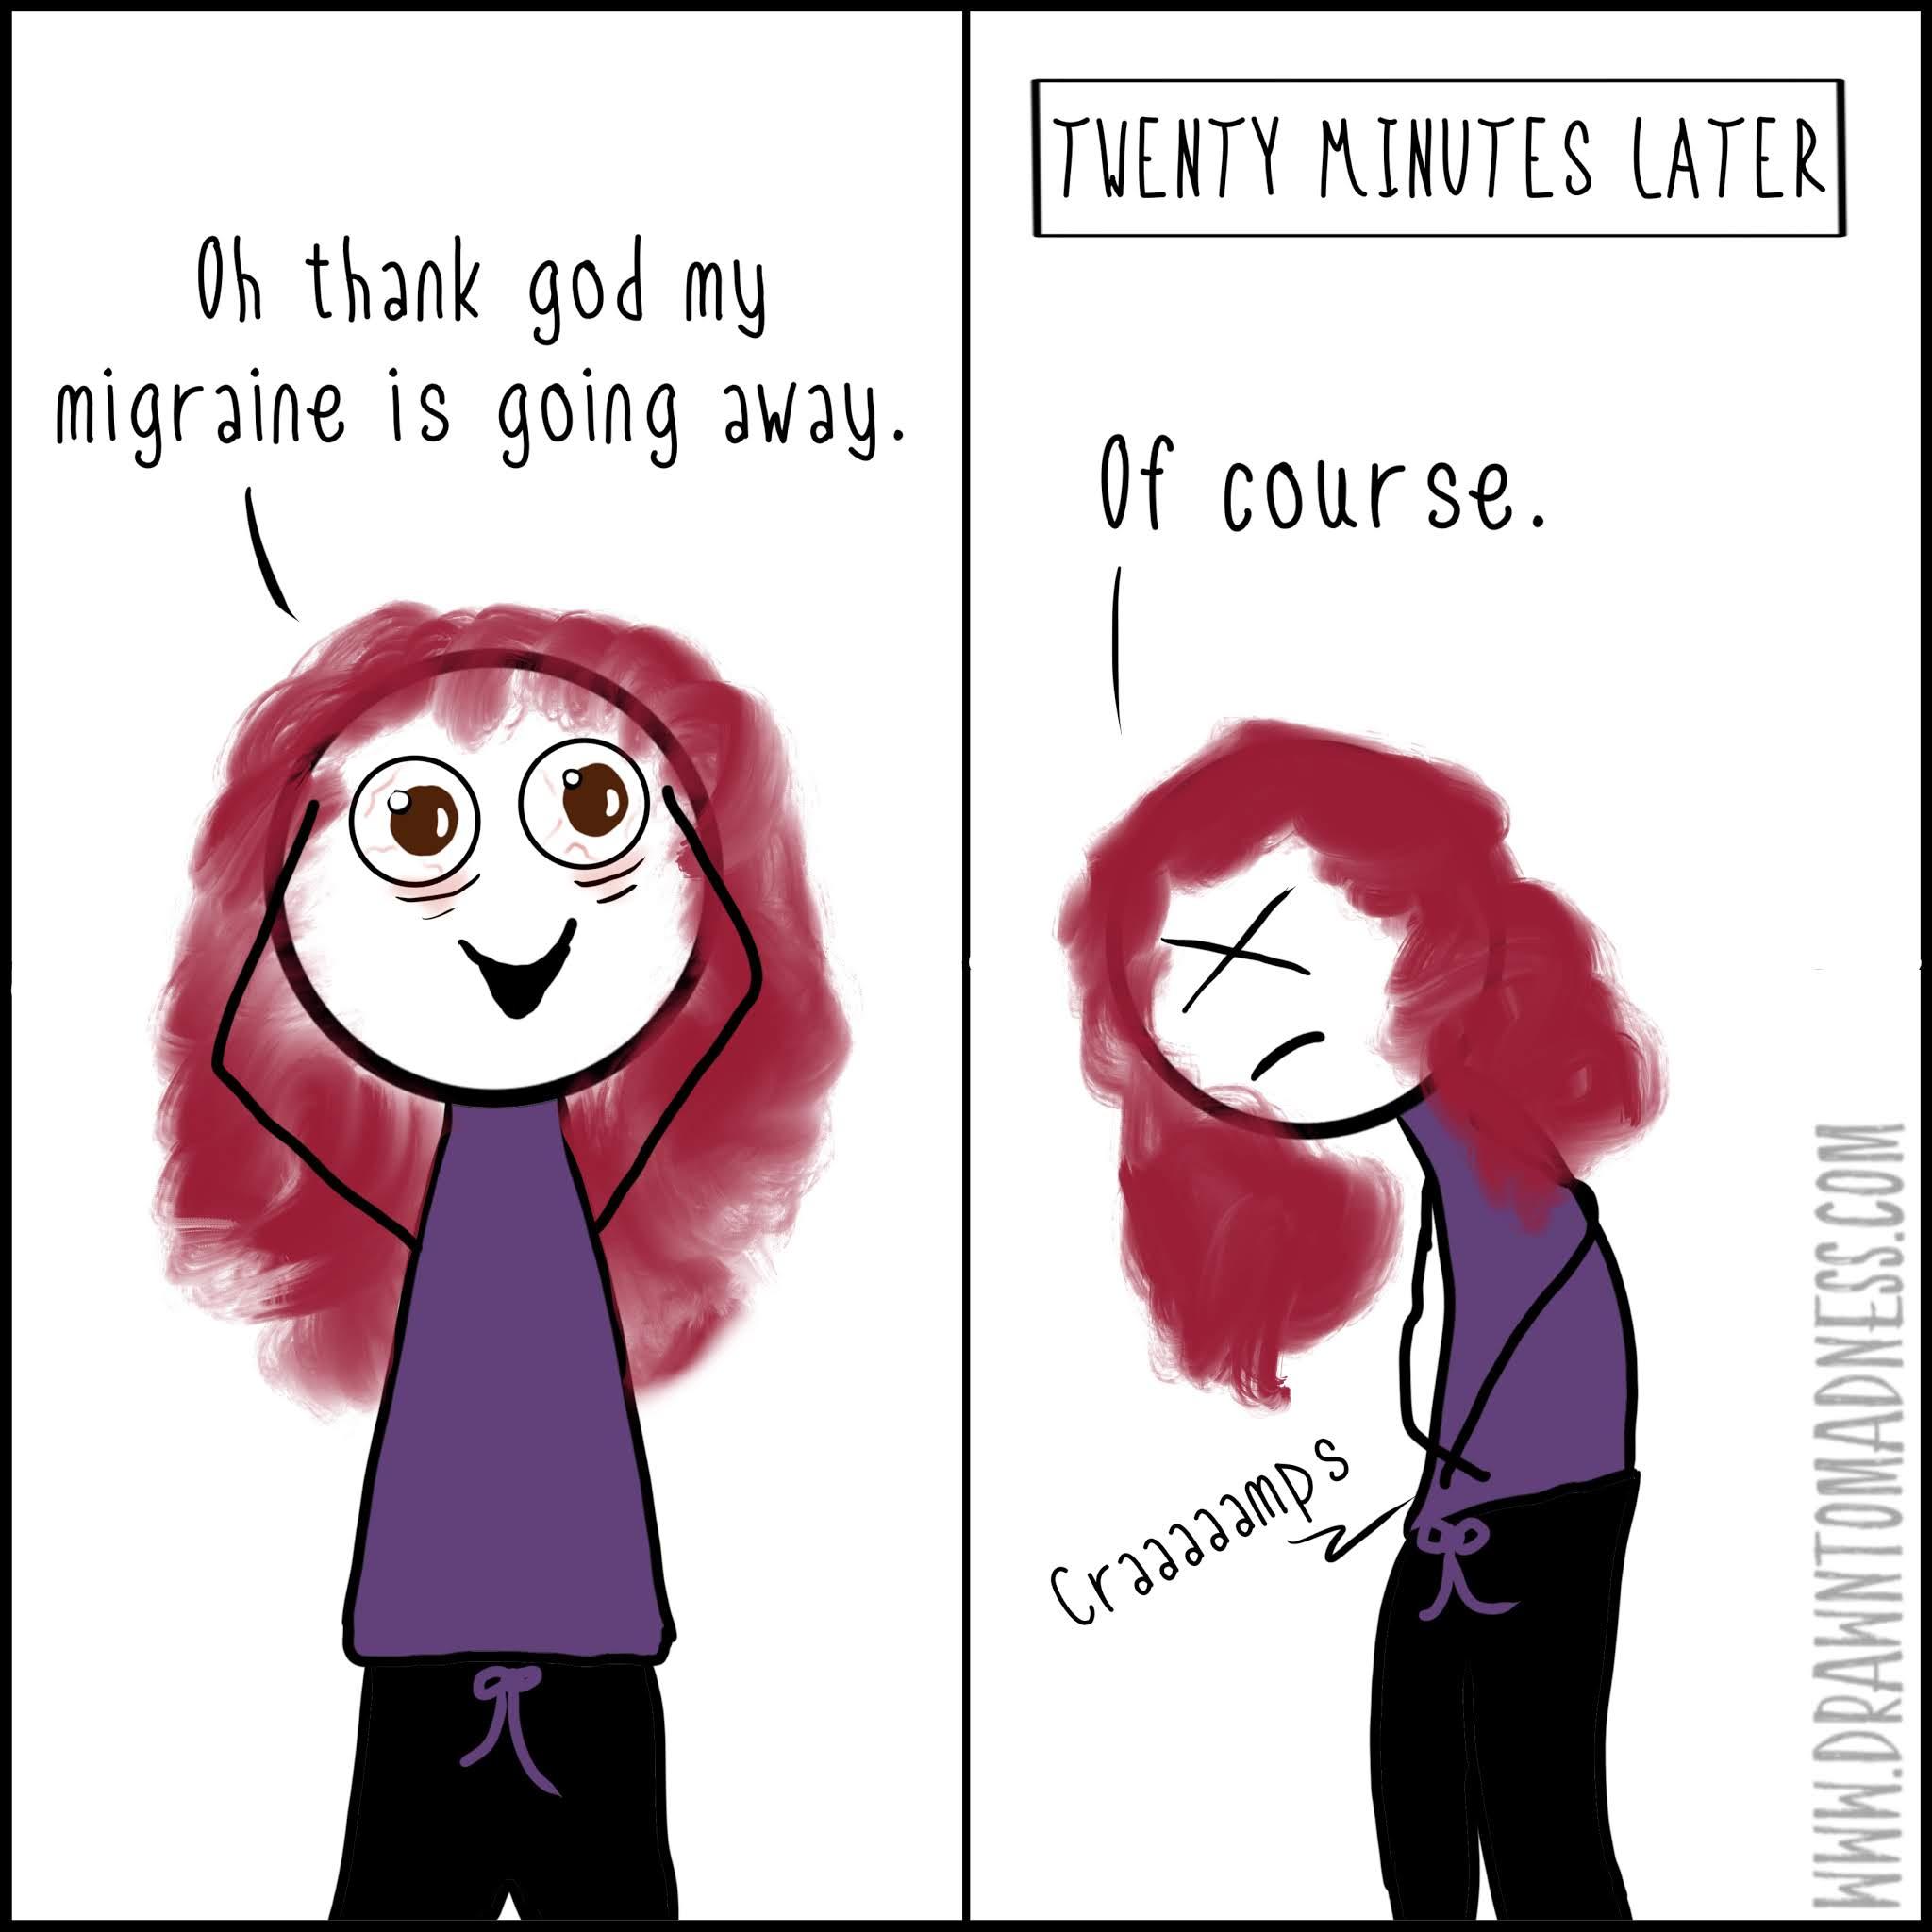 webcomic comics funny cartoon migraines headaches